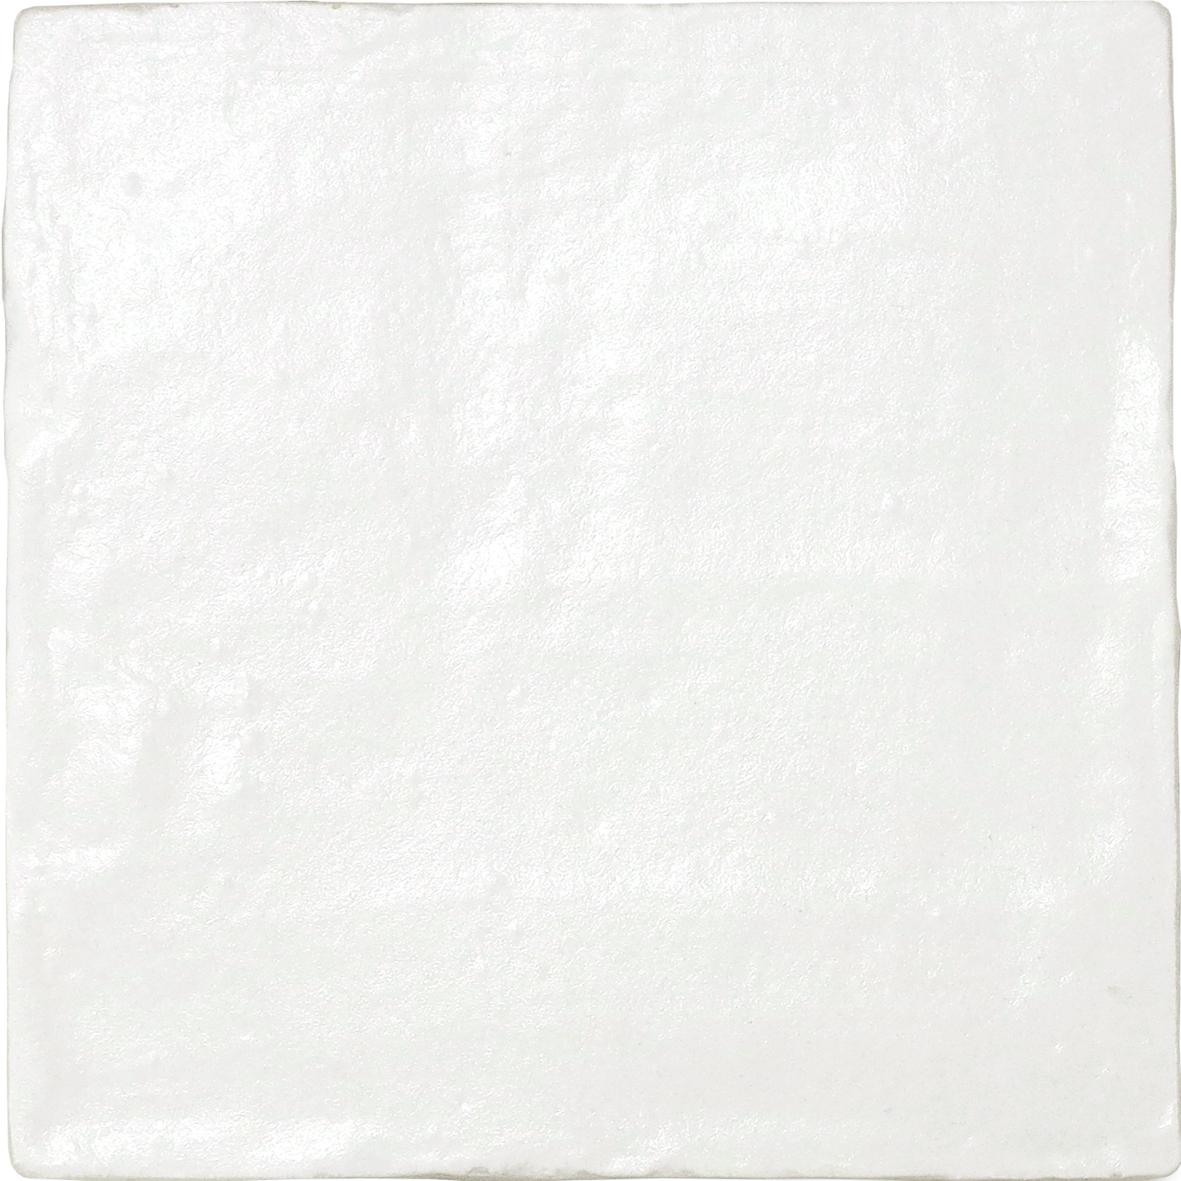 Mallorca White 10x10 cm